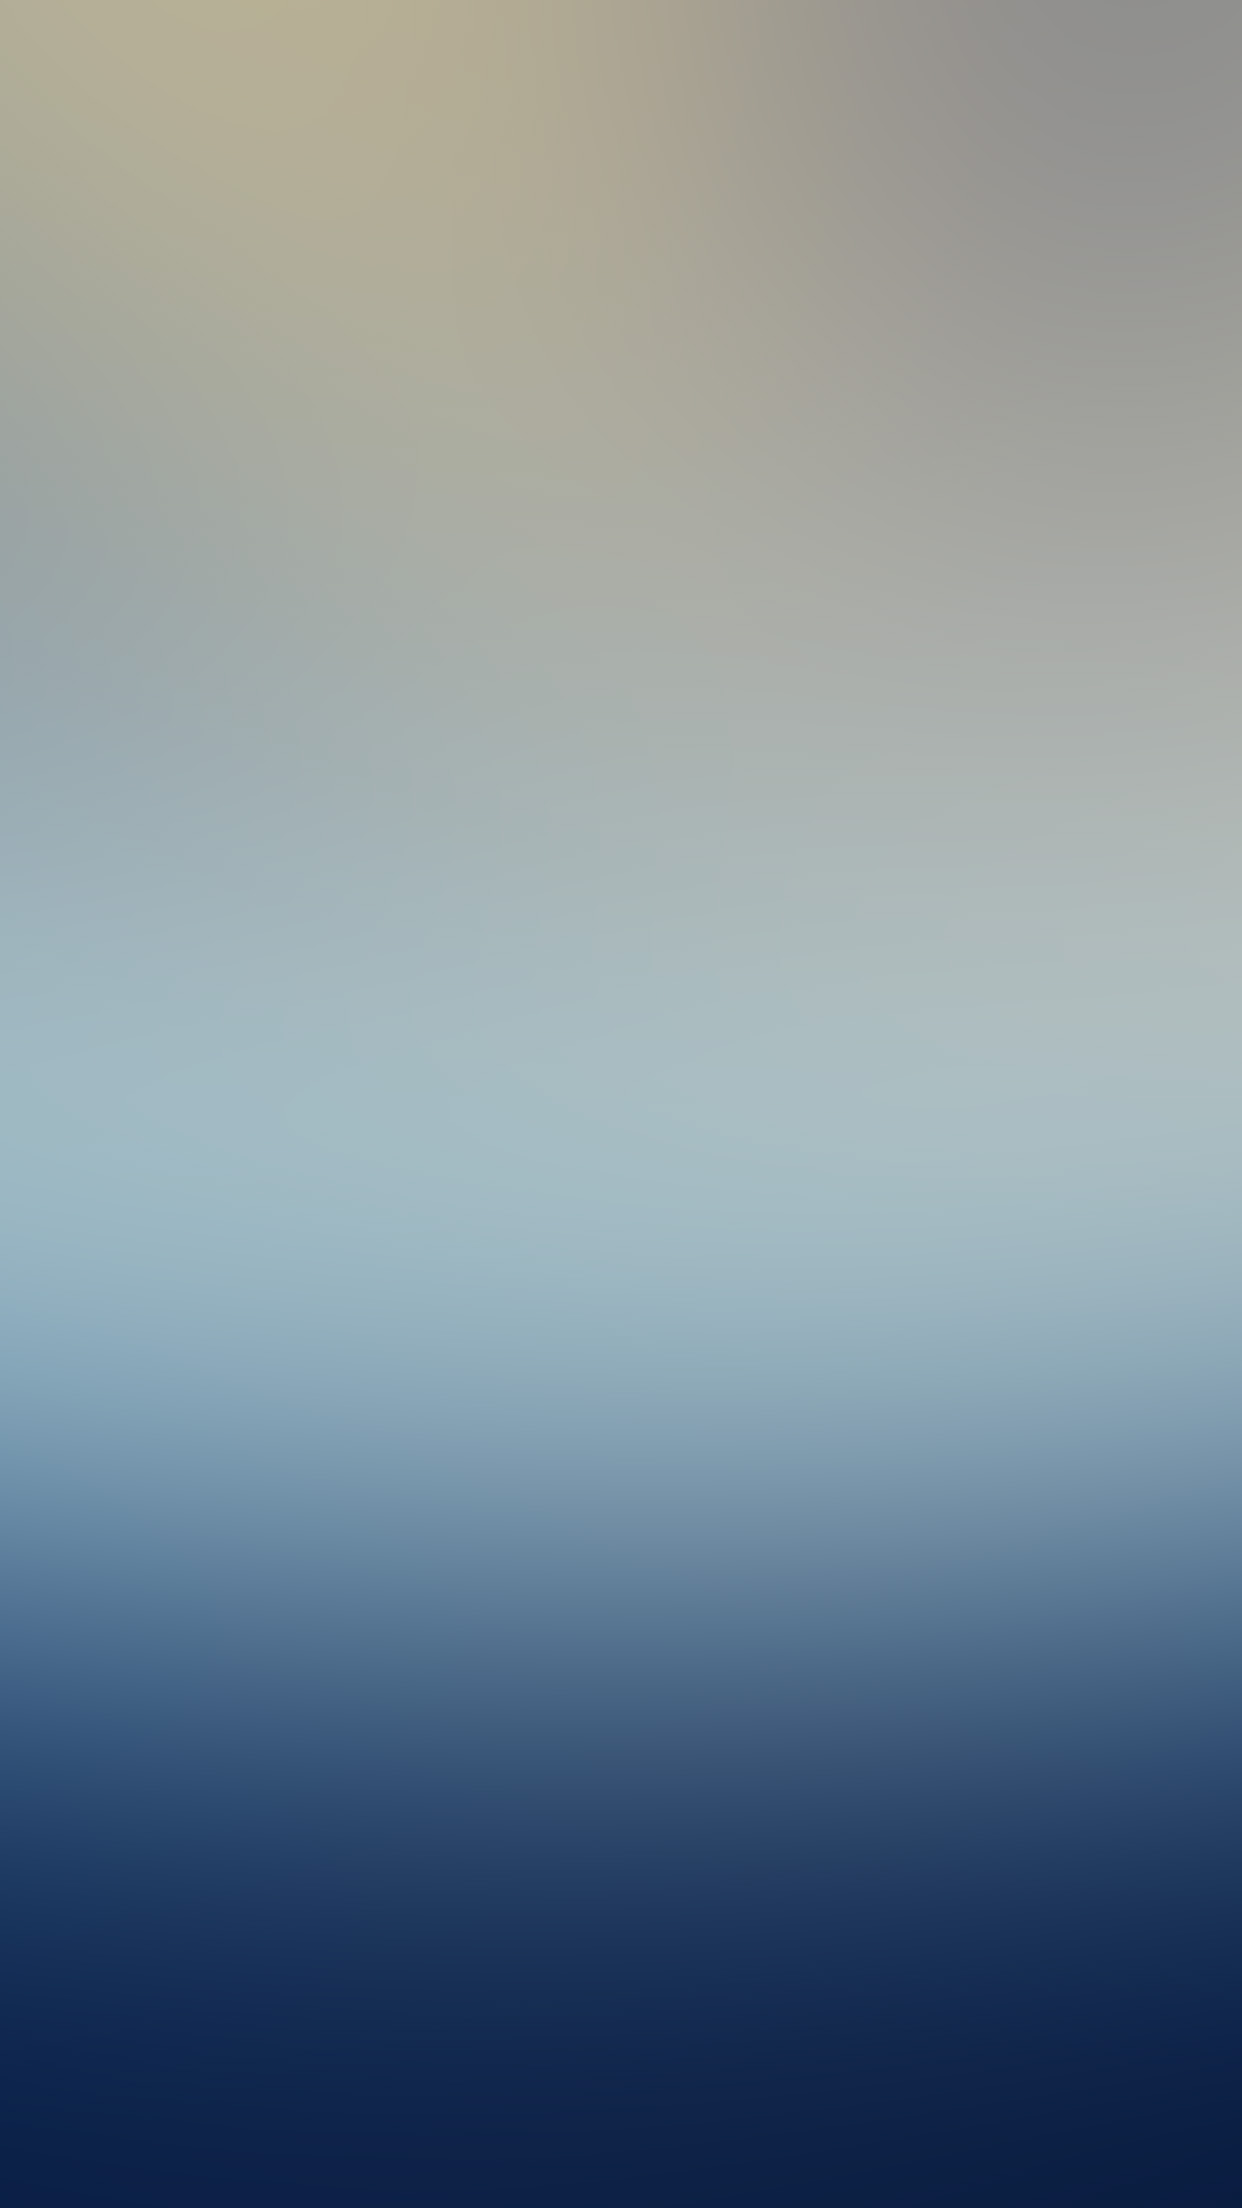 Cute Butterfly Phone Wallpapers Sh85 Earth On Space Blue Gradation Blur Wallpaper